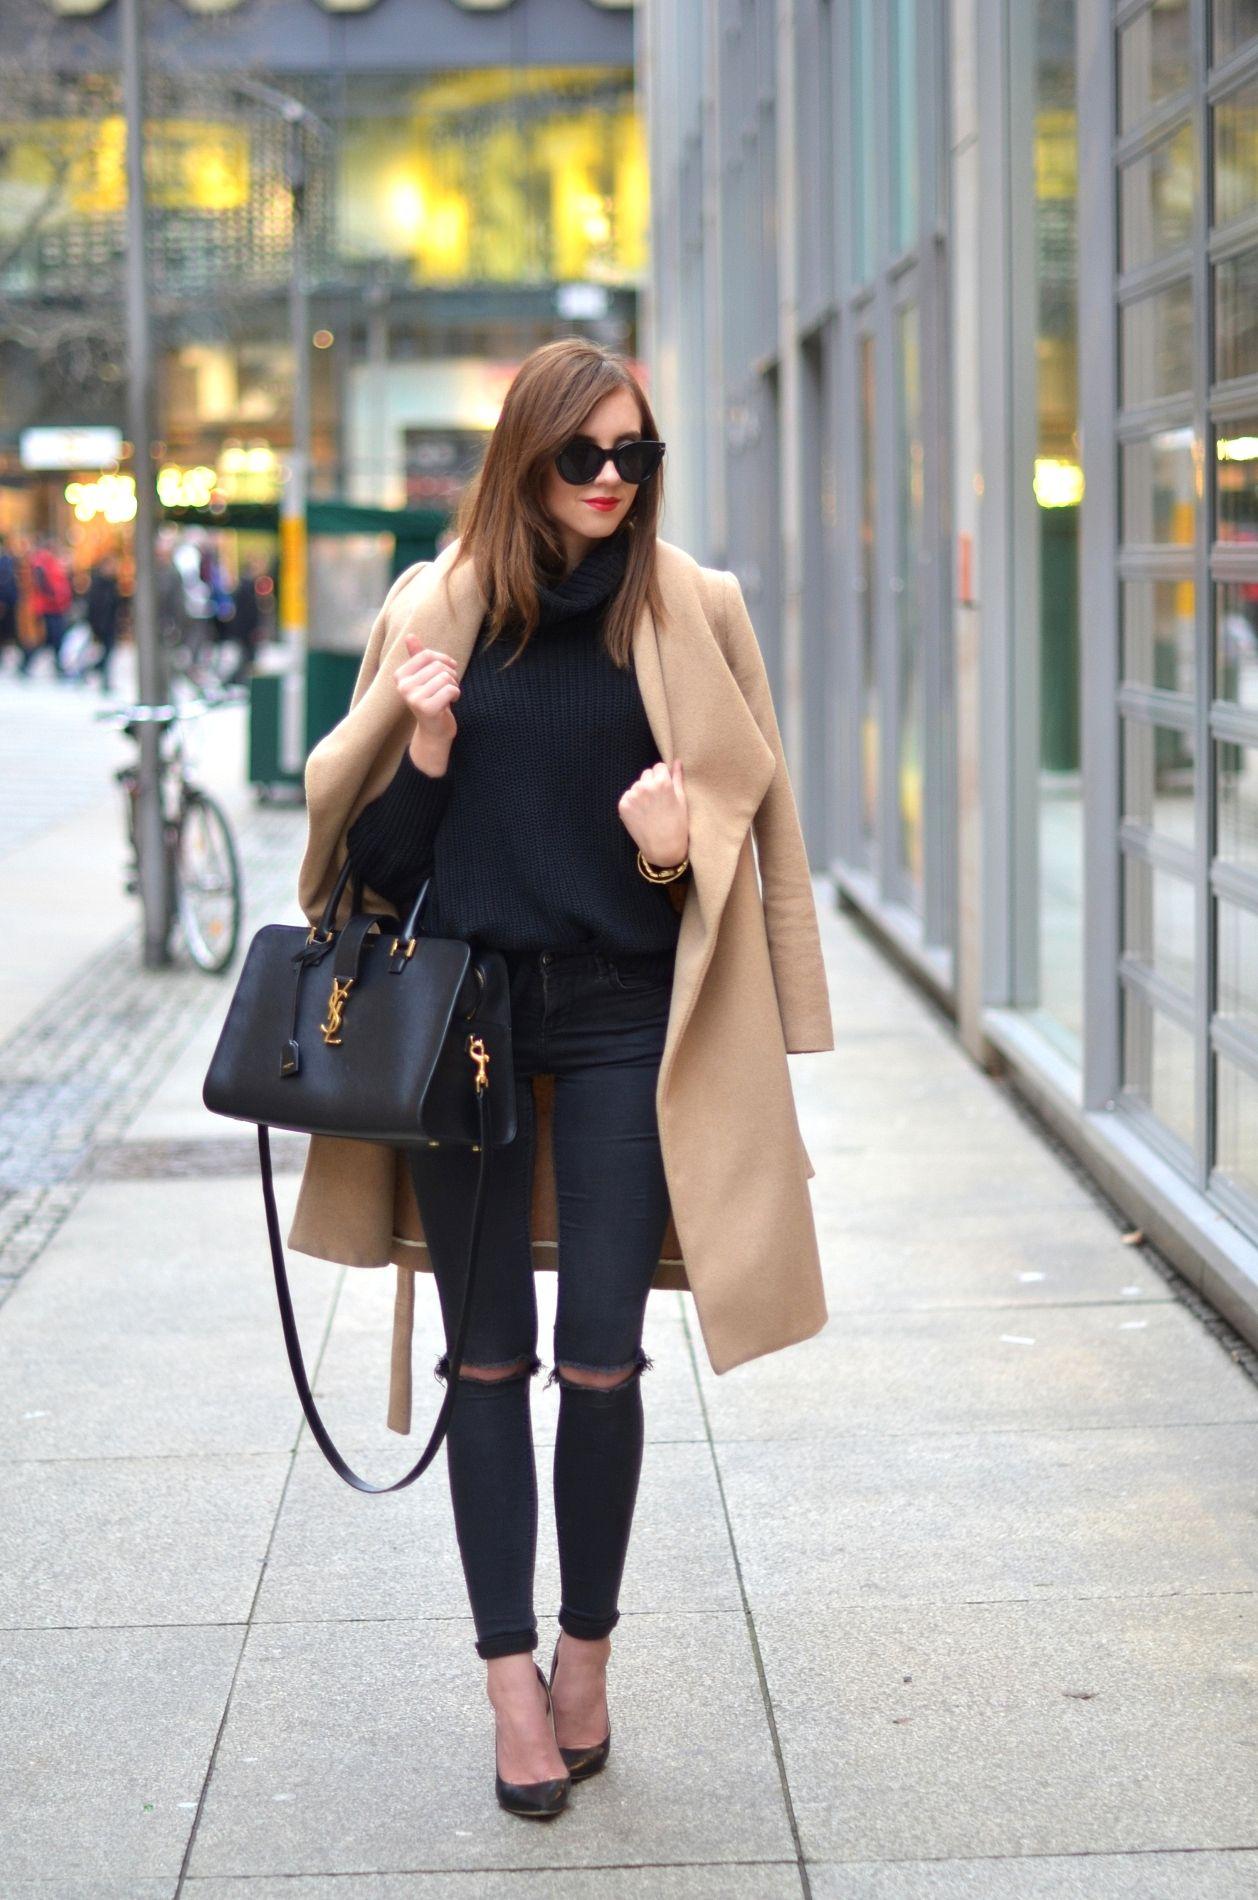 ef170878af33 American Apparel turtle neck Topshop jeans Mango coat Jimmy Choo heels  Saint Laurent bag http